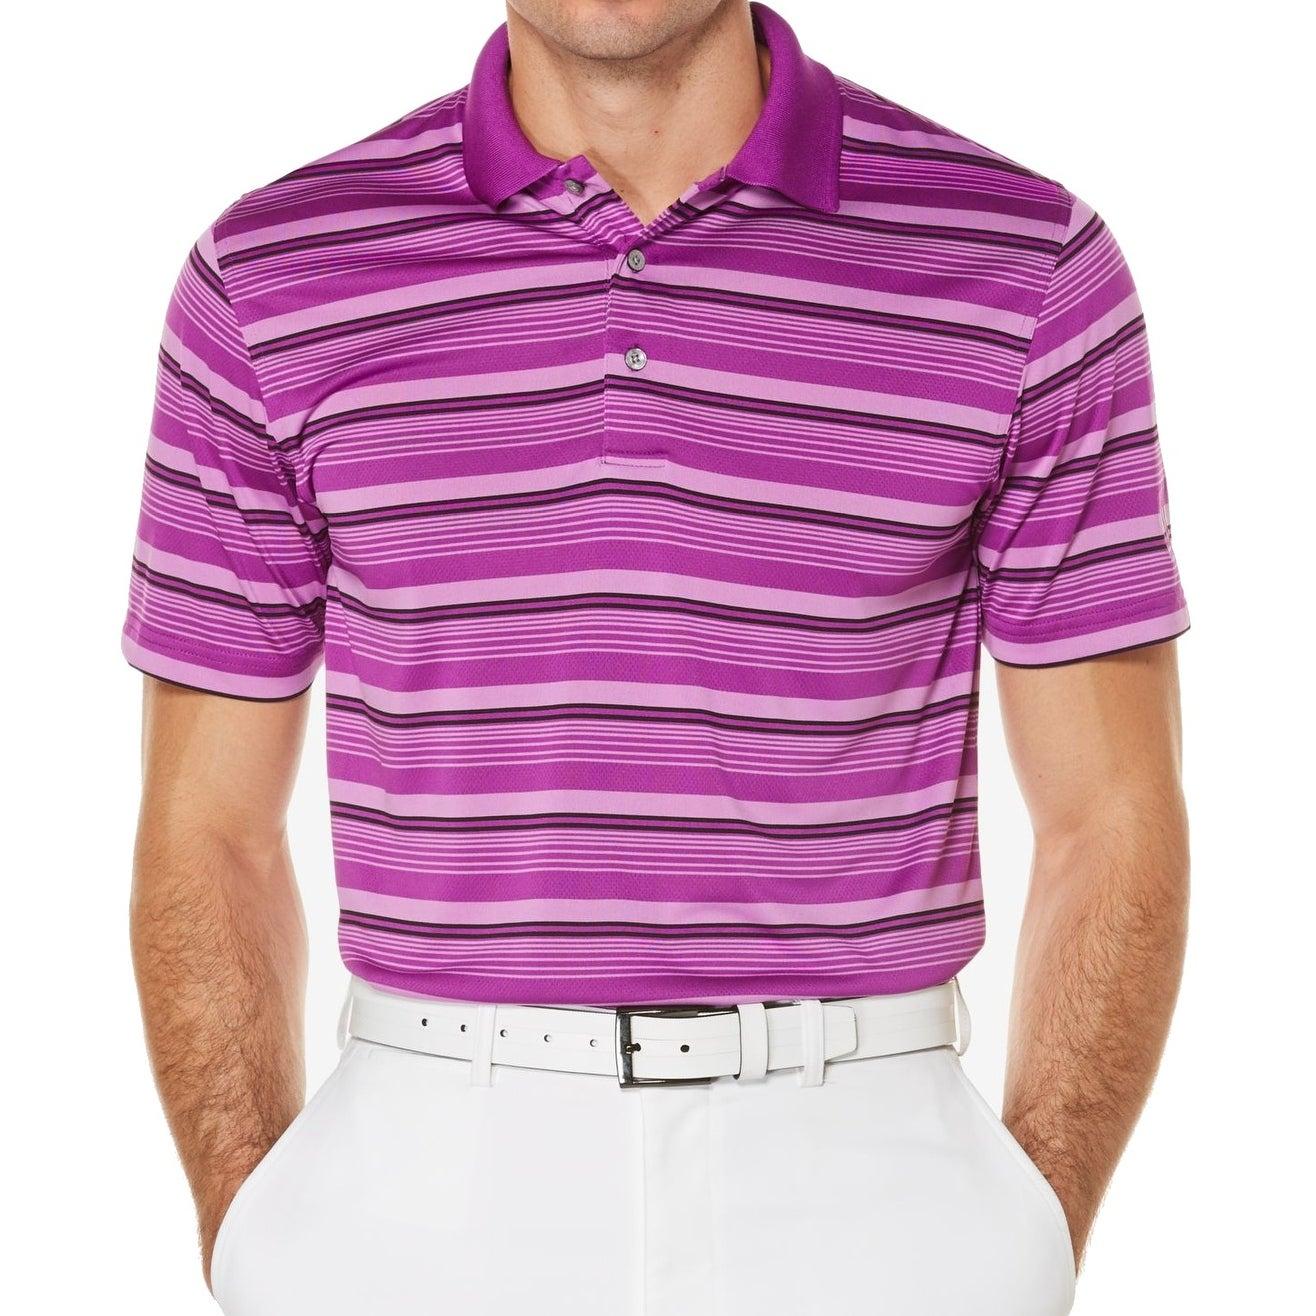 pga tour long sleeve polo shirts